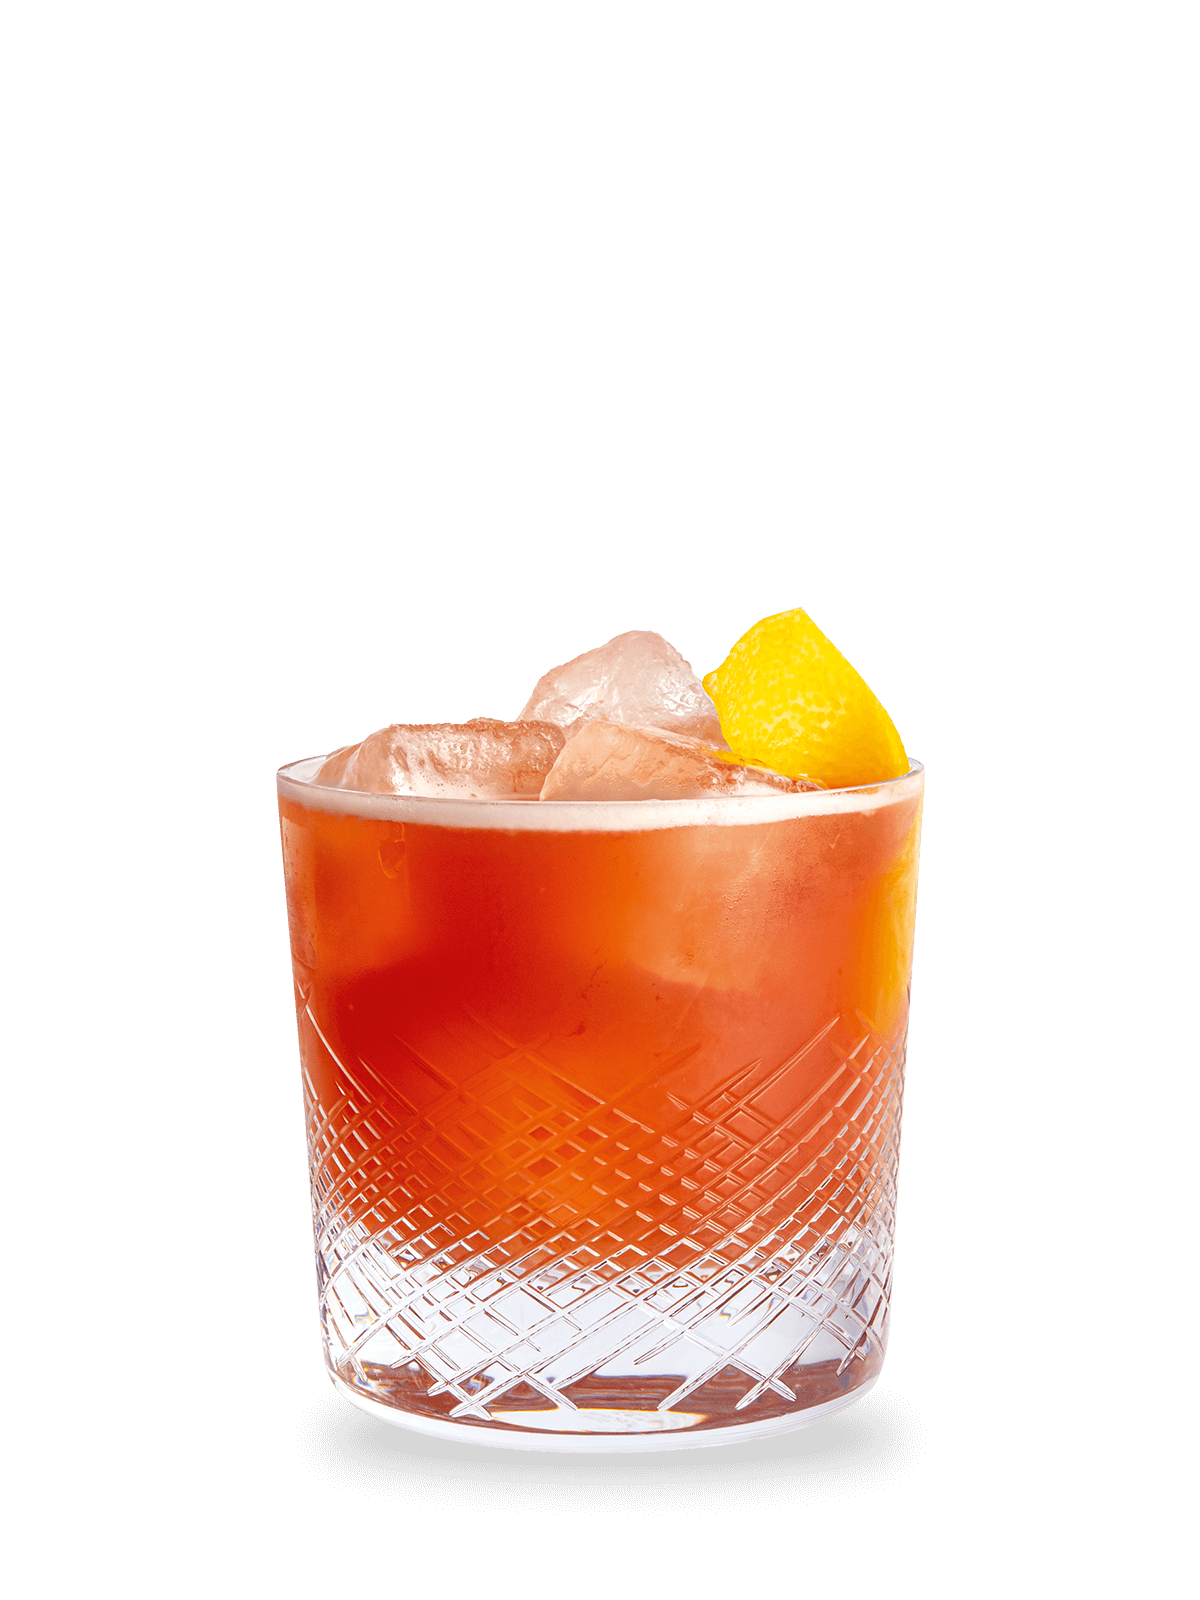 Gin und Tee Cocktail Rezept Sloe Upper Lip mit Elephant Sloe Gin